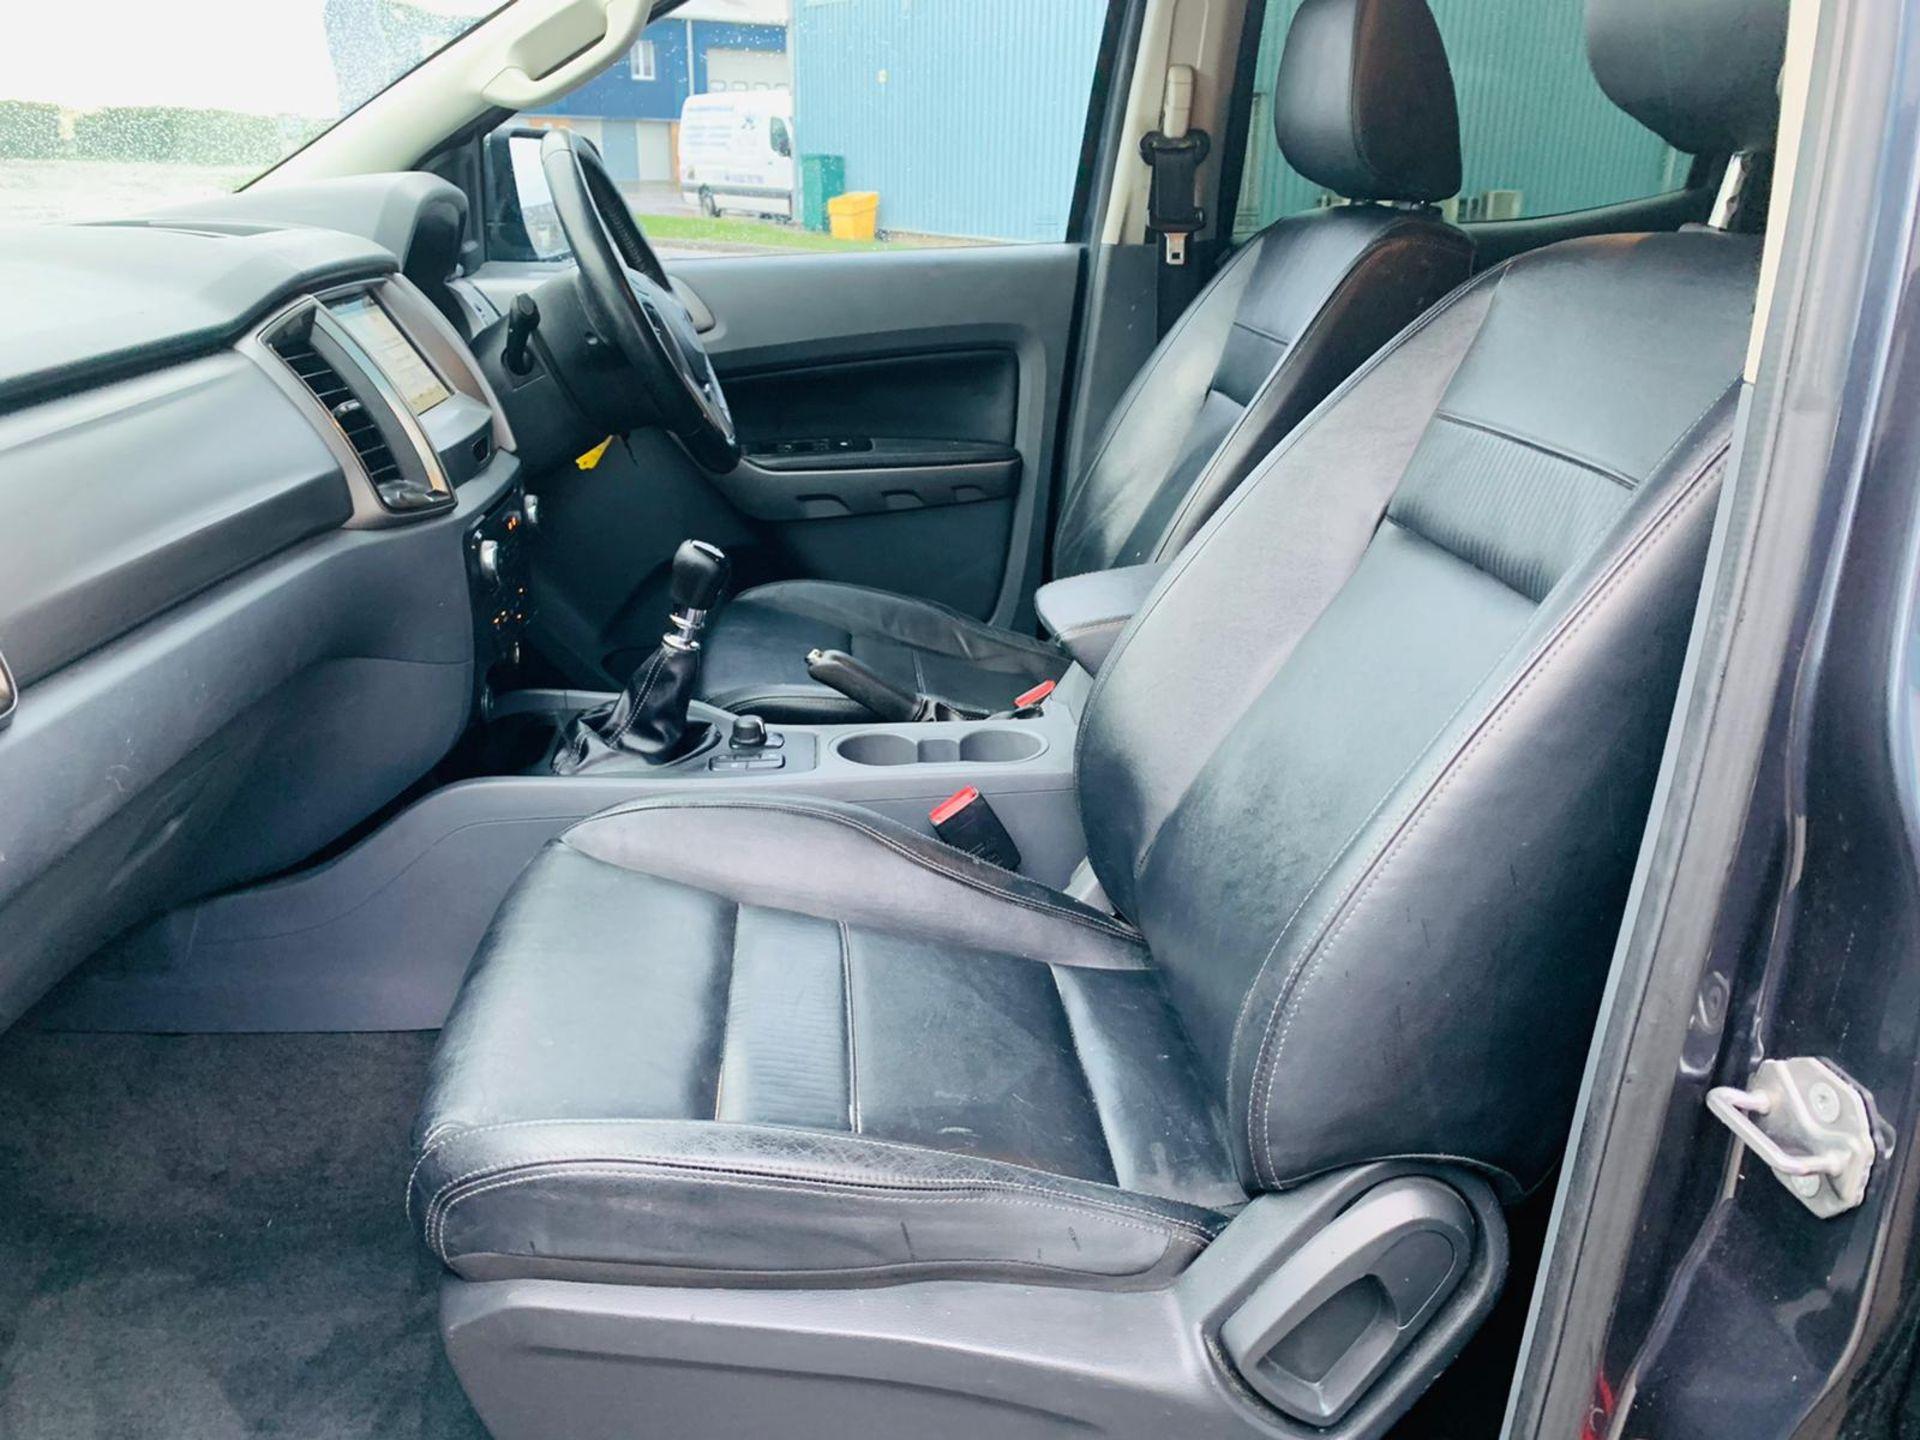 (RESERVE MET) Ford Ranger 2.2 TDCI LTD 4x4 Double Cab 2017 17 Reg - Reversing Cam -Leather - Sat Nav - Image 29 of 32